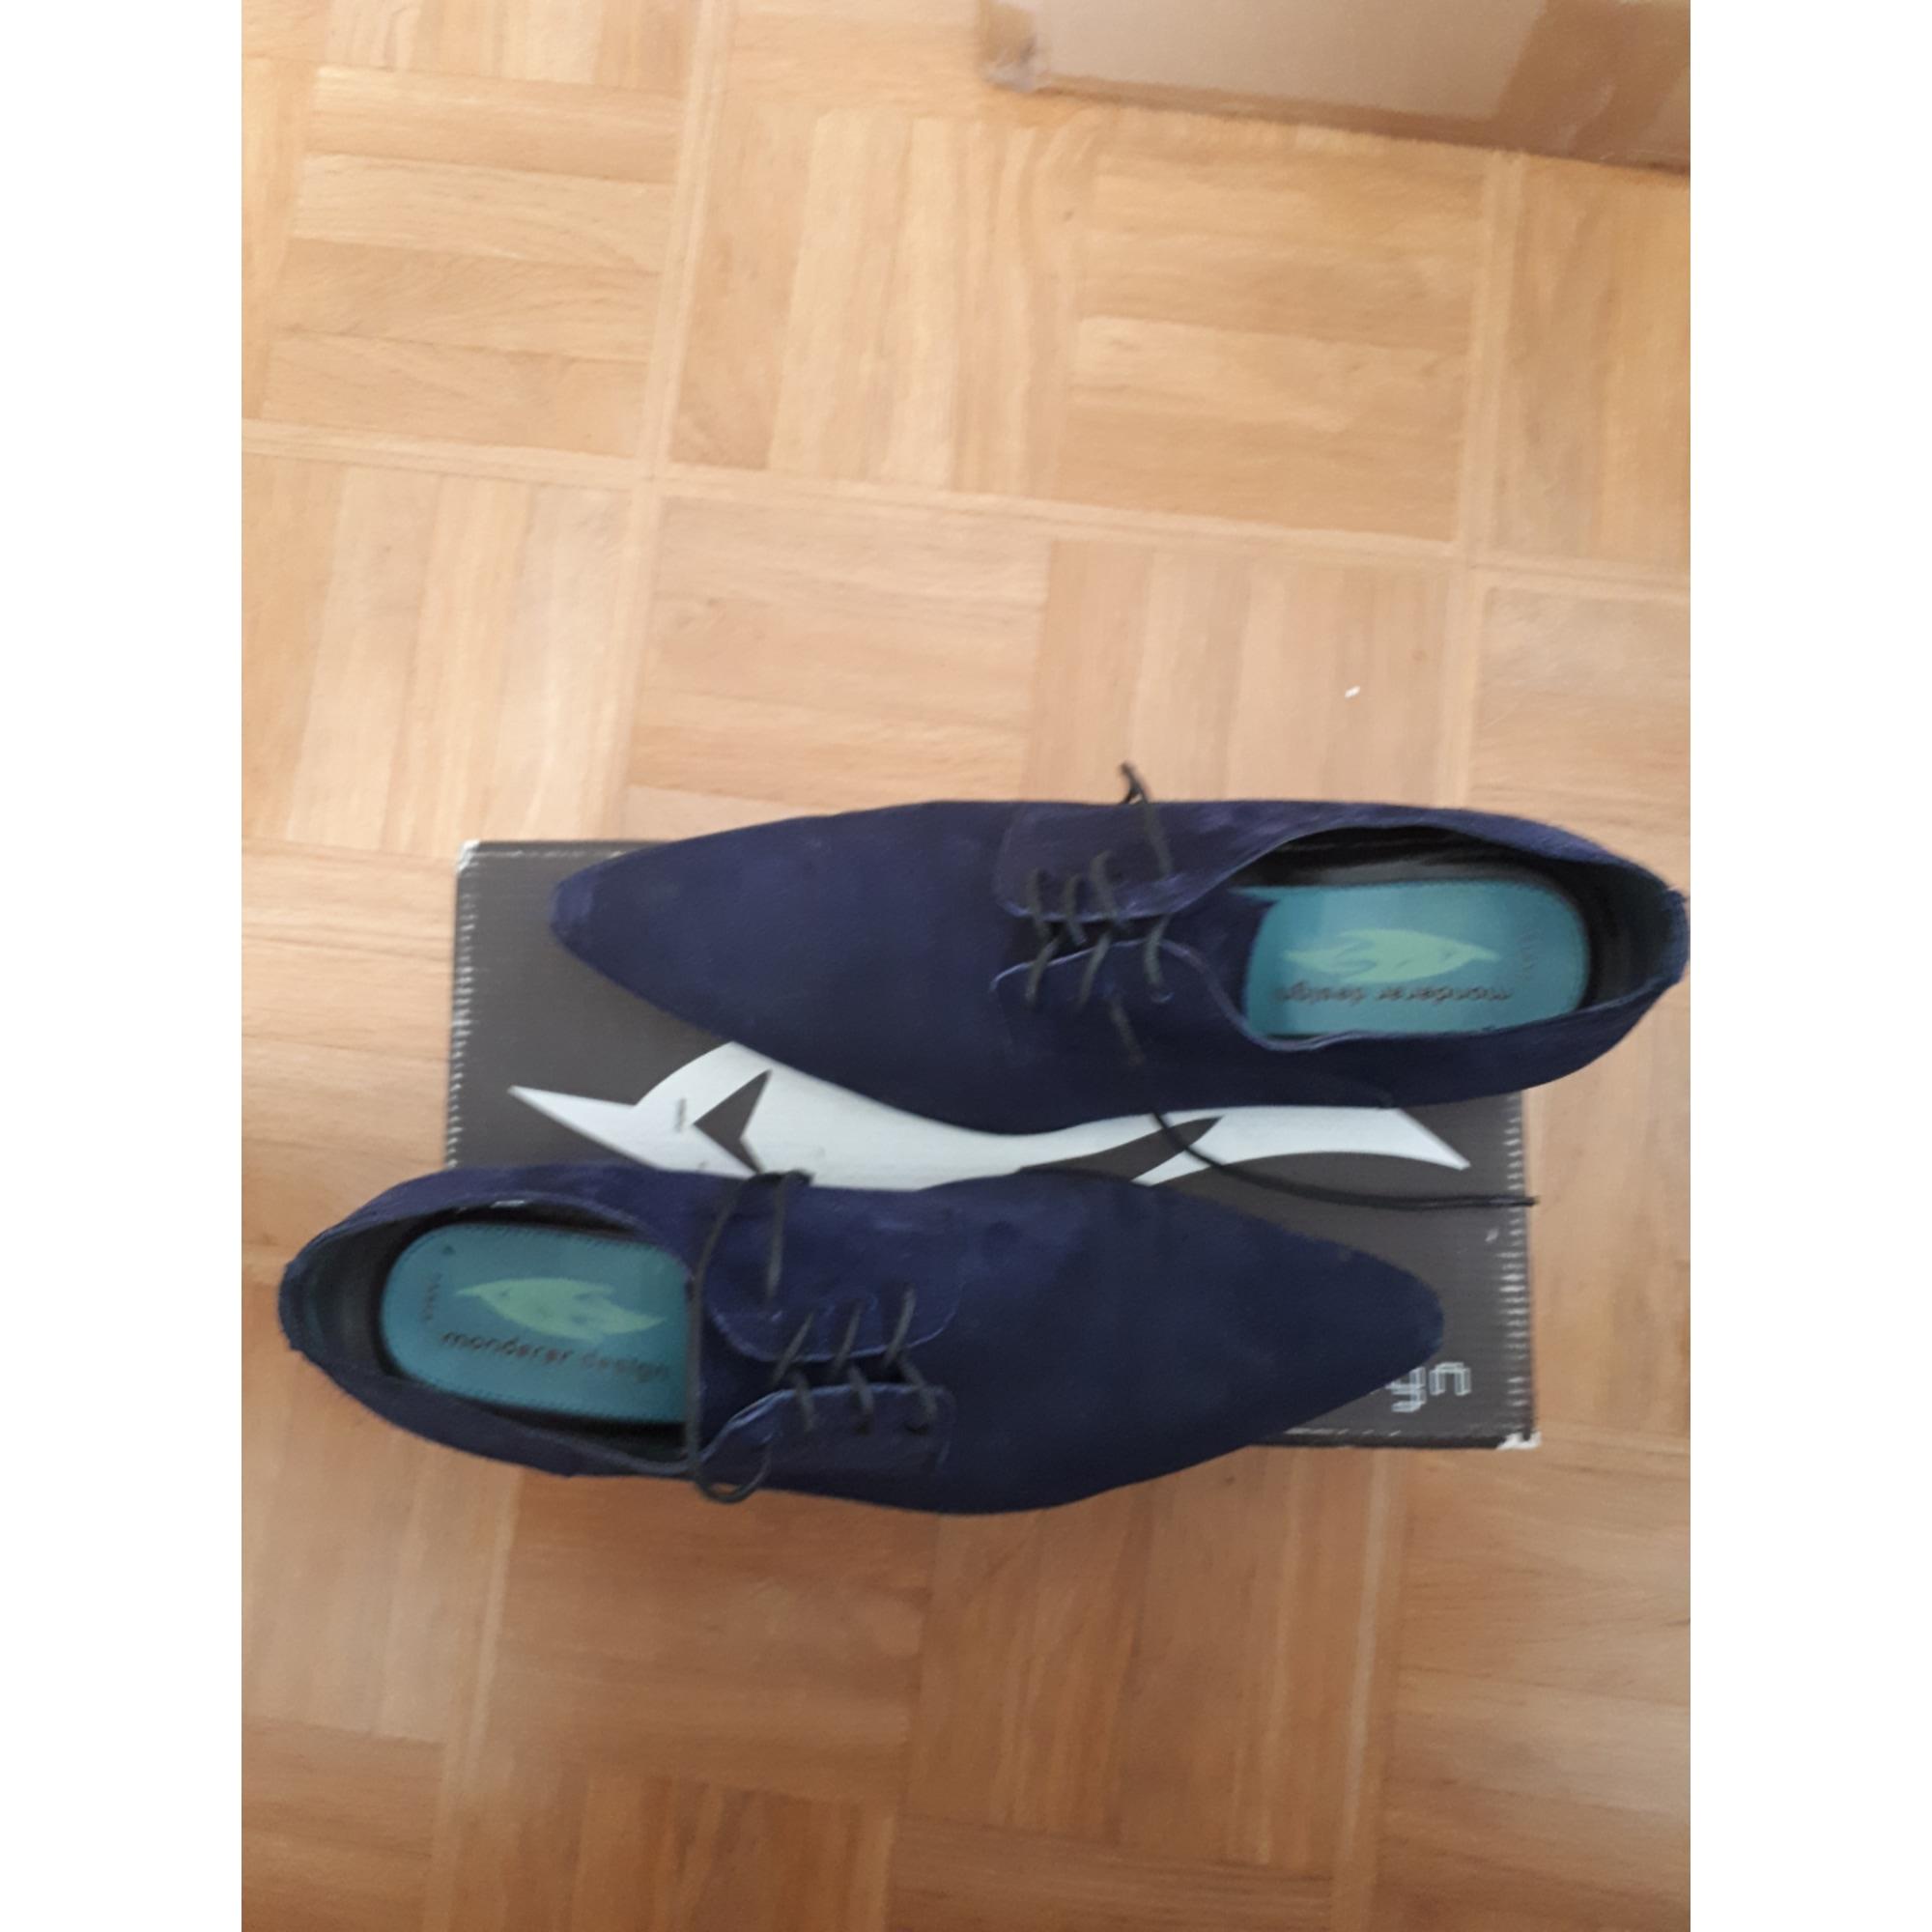 Chaussures à lacets MONDERER Bleu, bleu marine, bleu turquoise